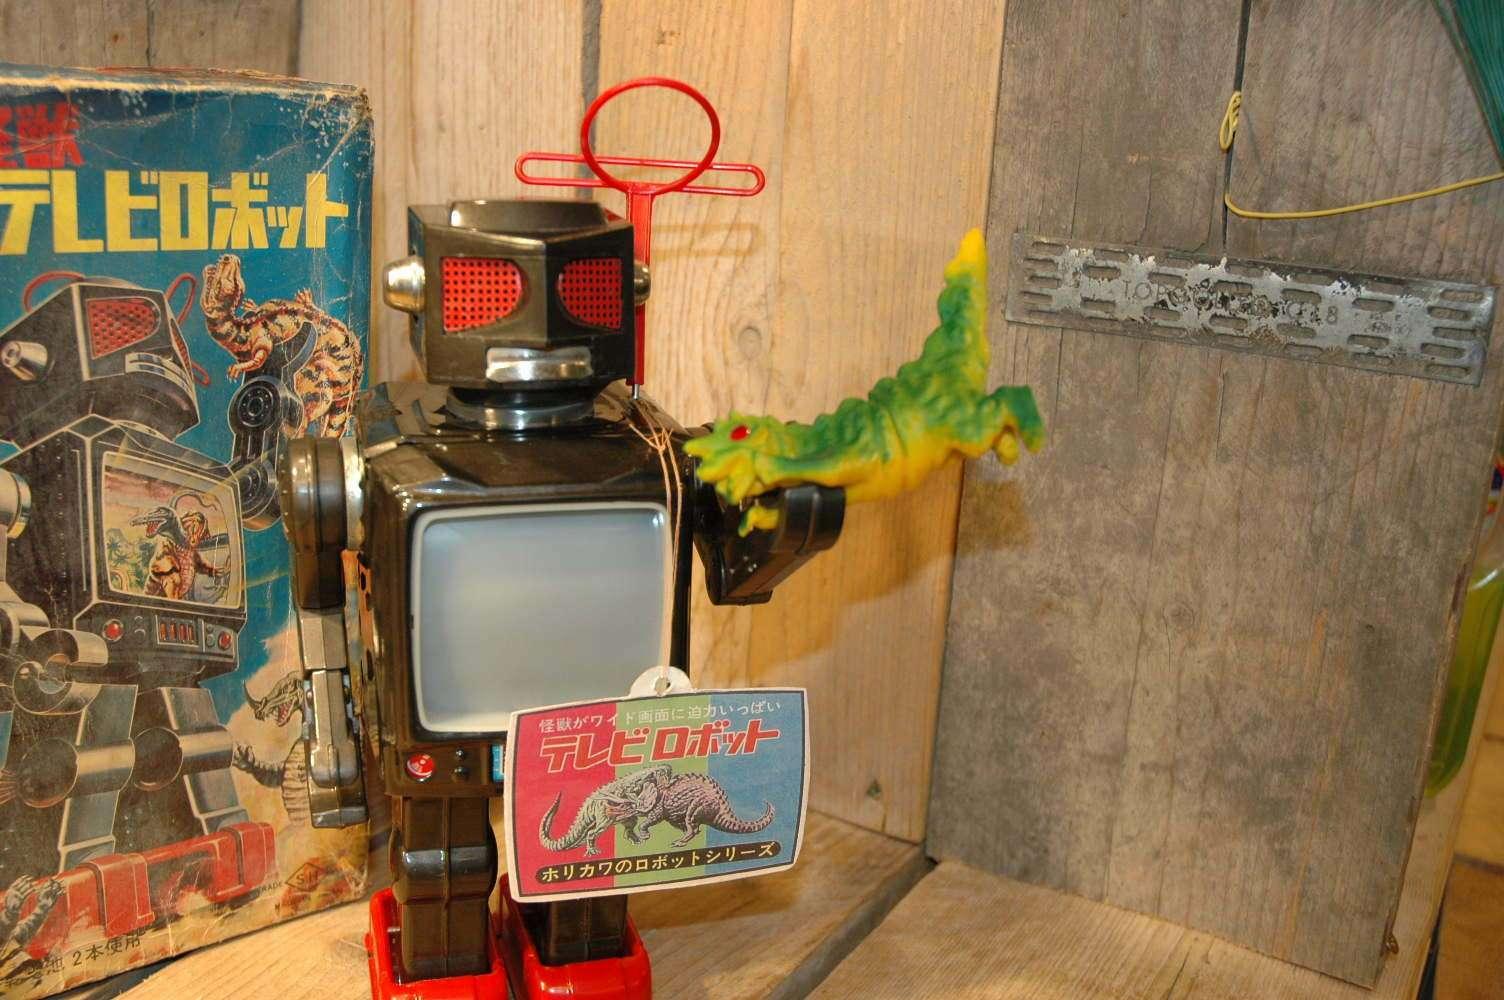 Horikawa - Space Robot Dinosaur